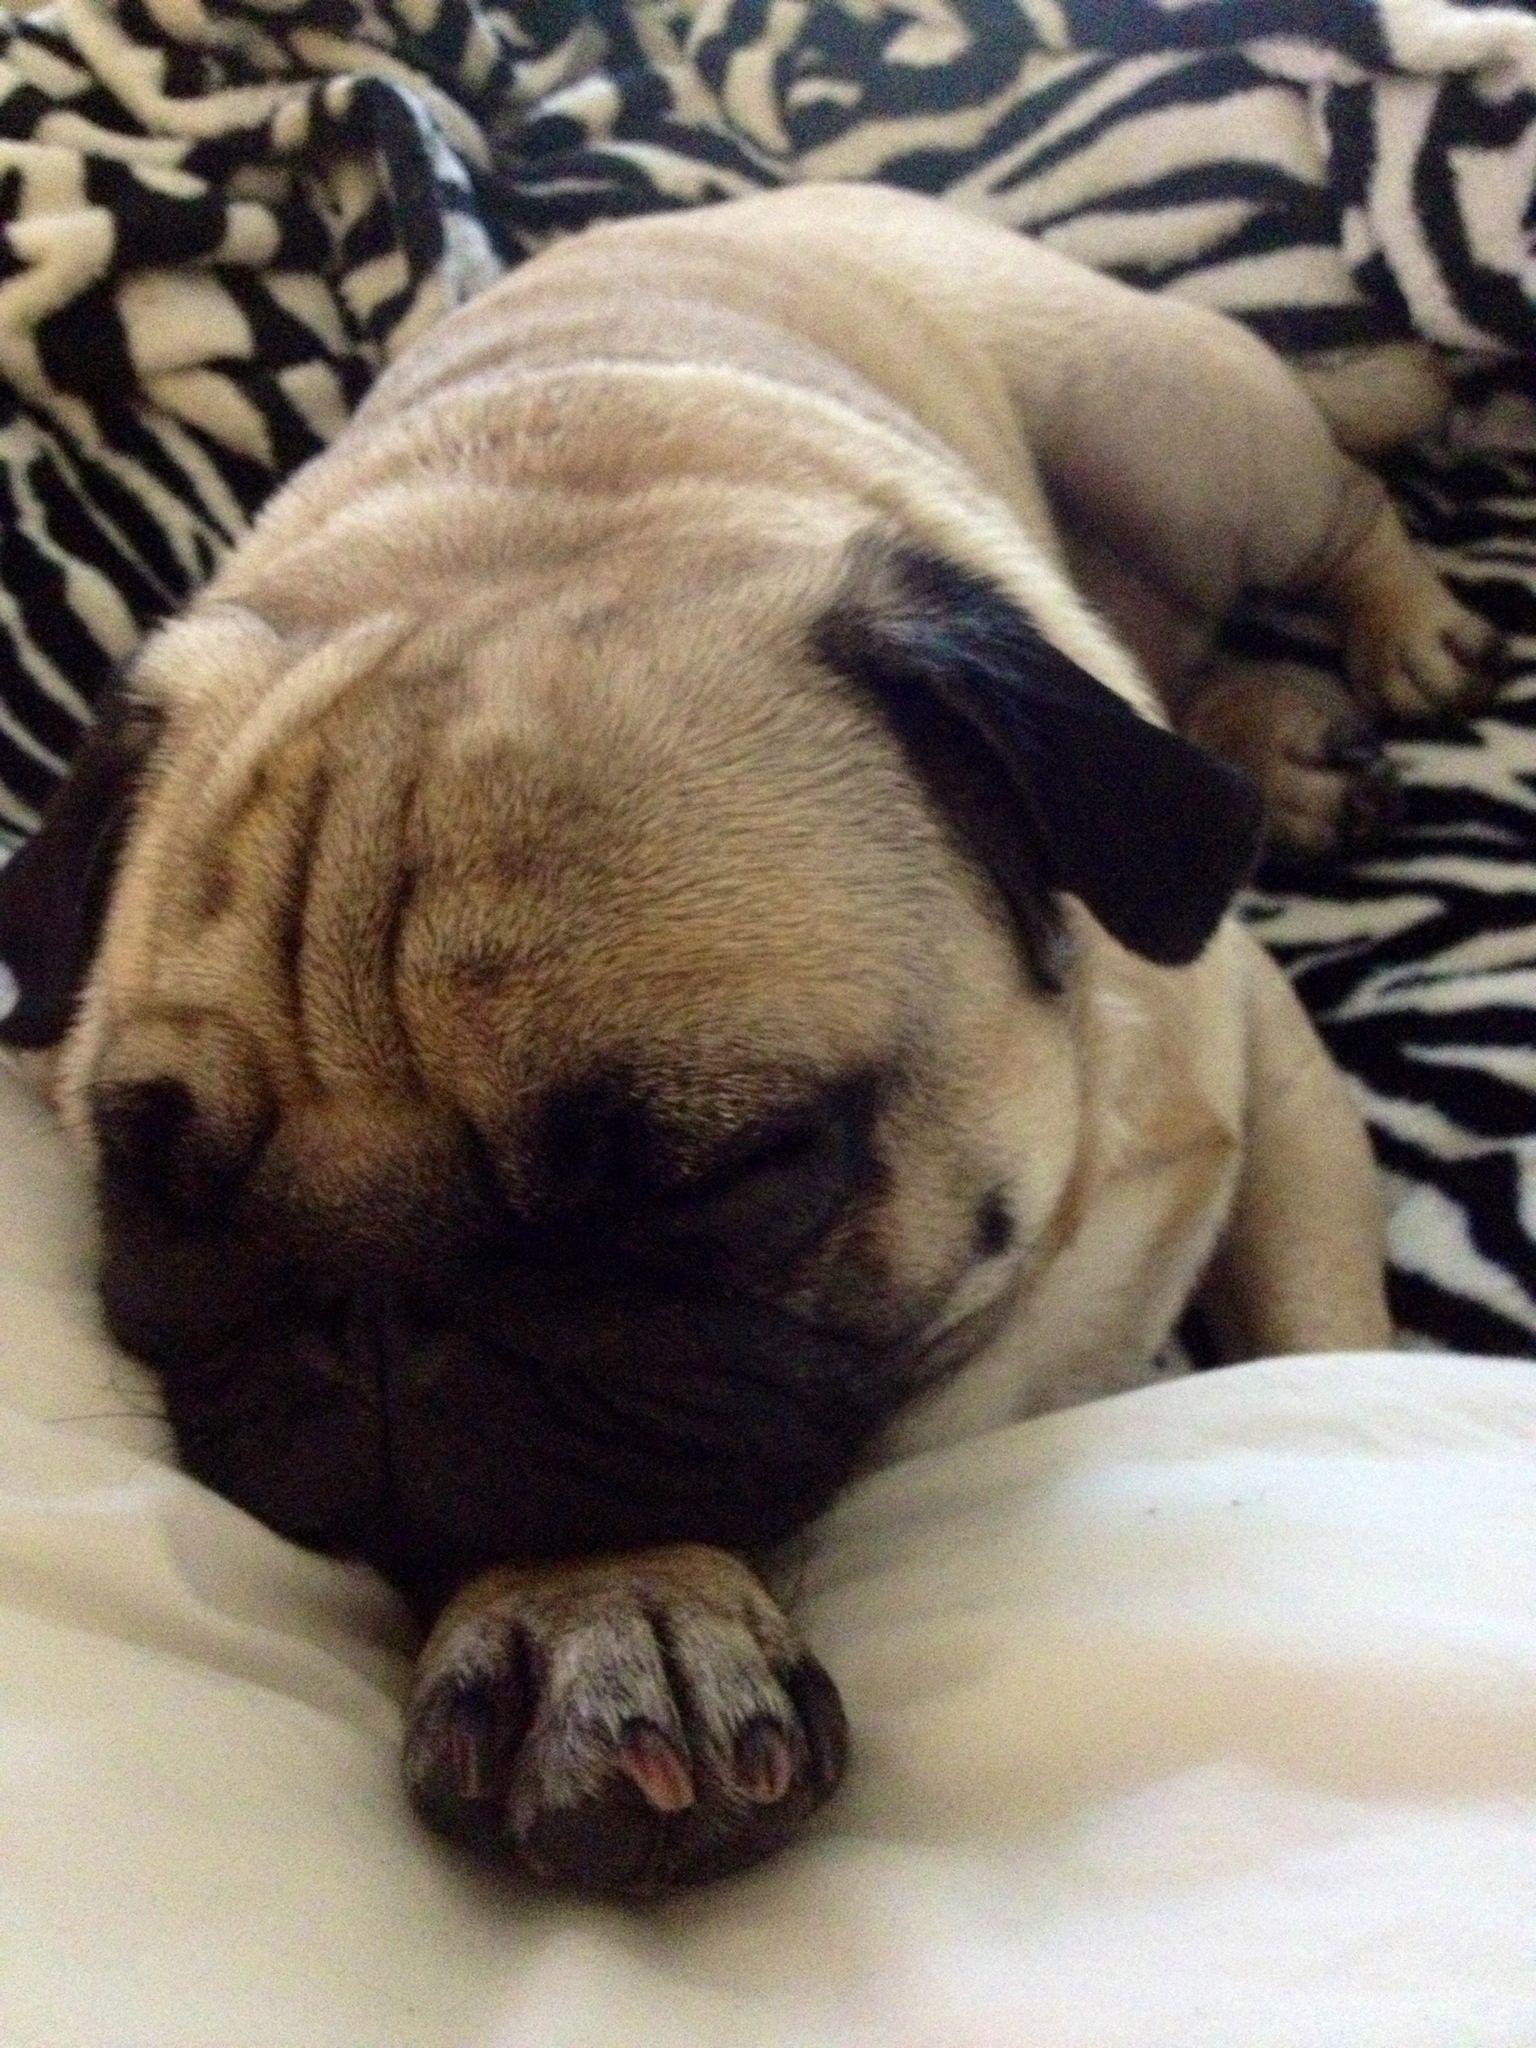 Sleeping Pug Animal Pugs Cute Animals Animals